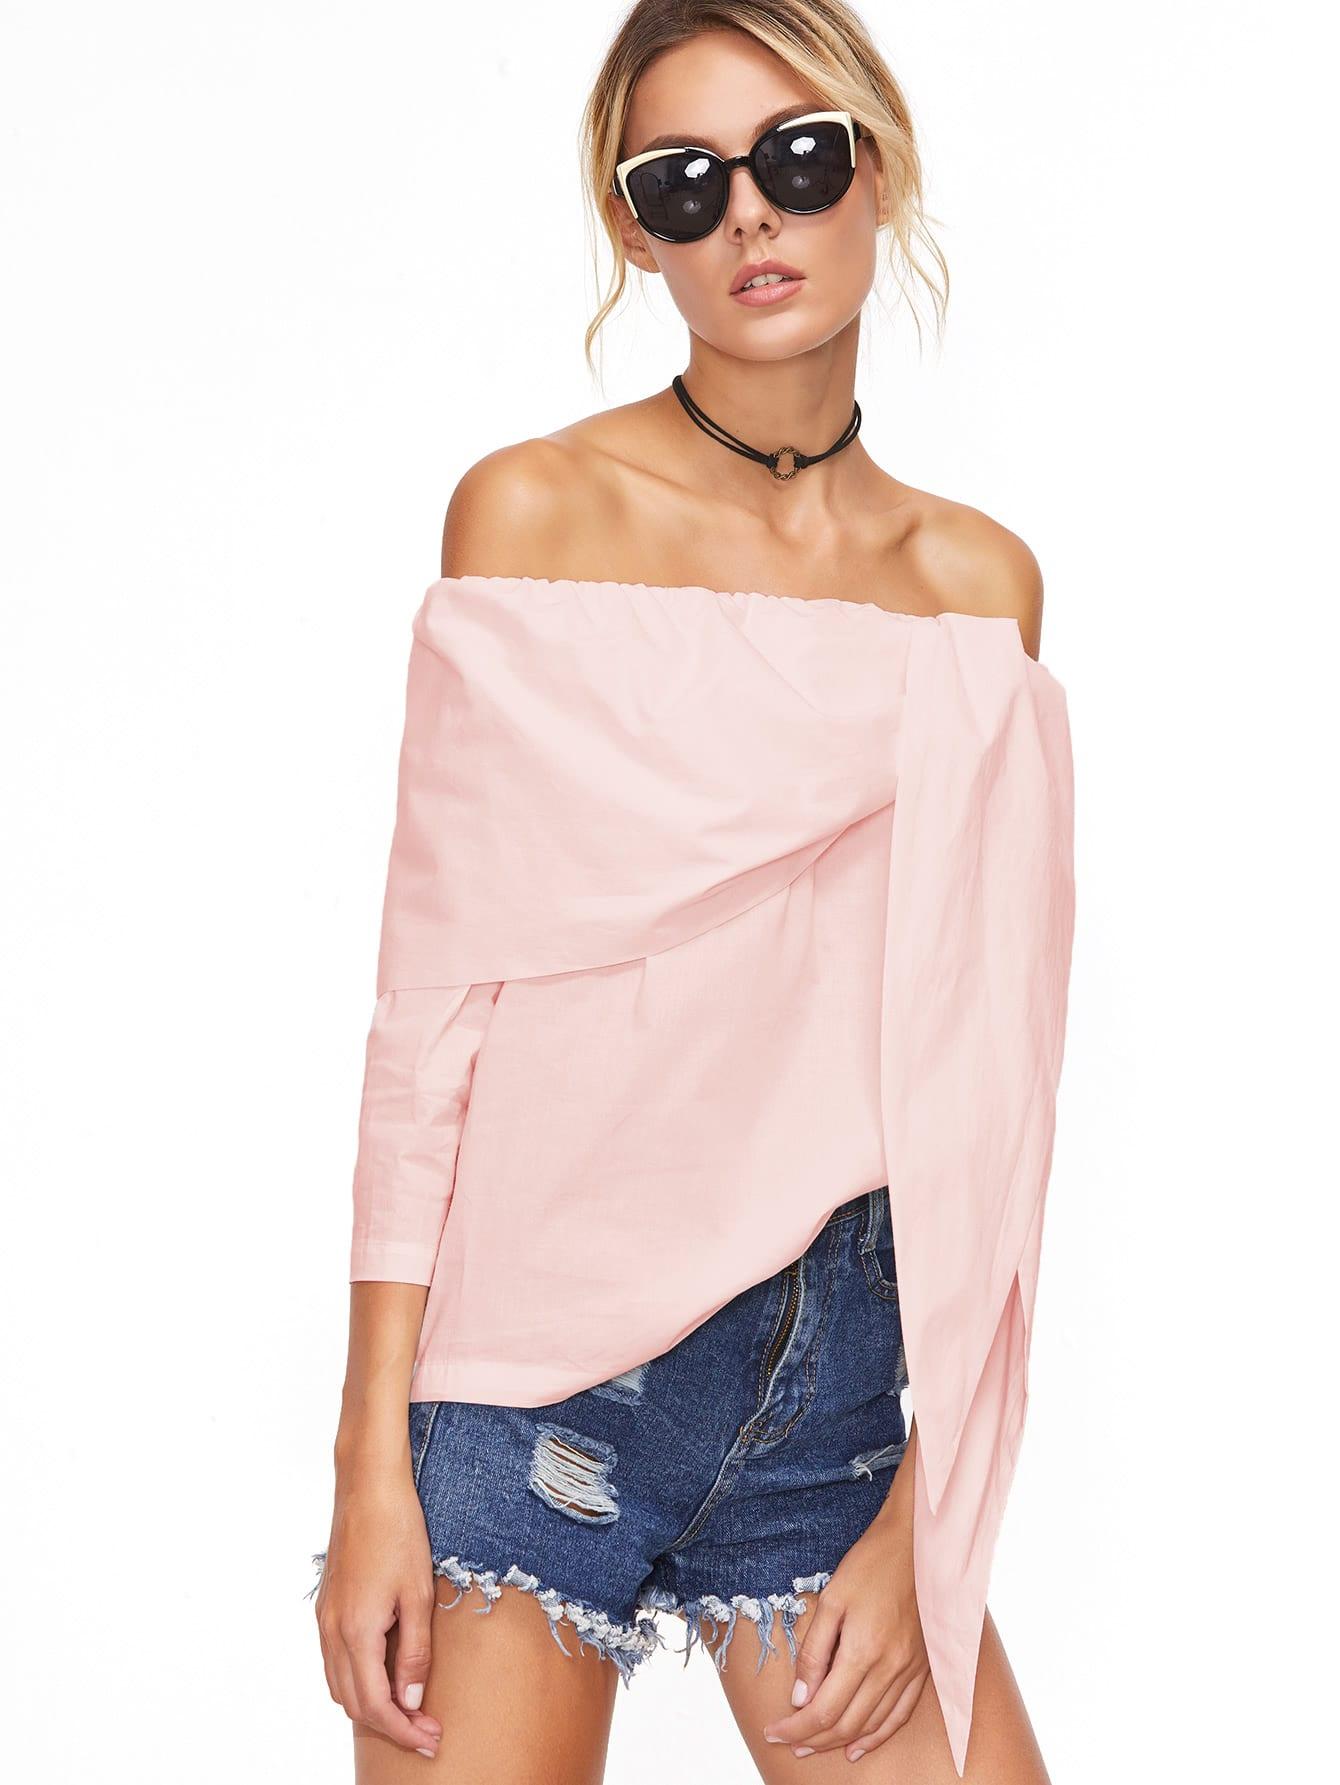 blouse170228701_22